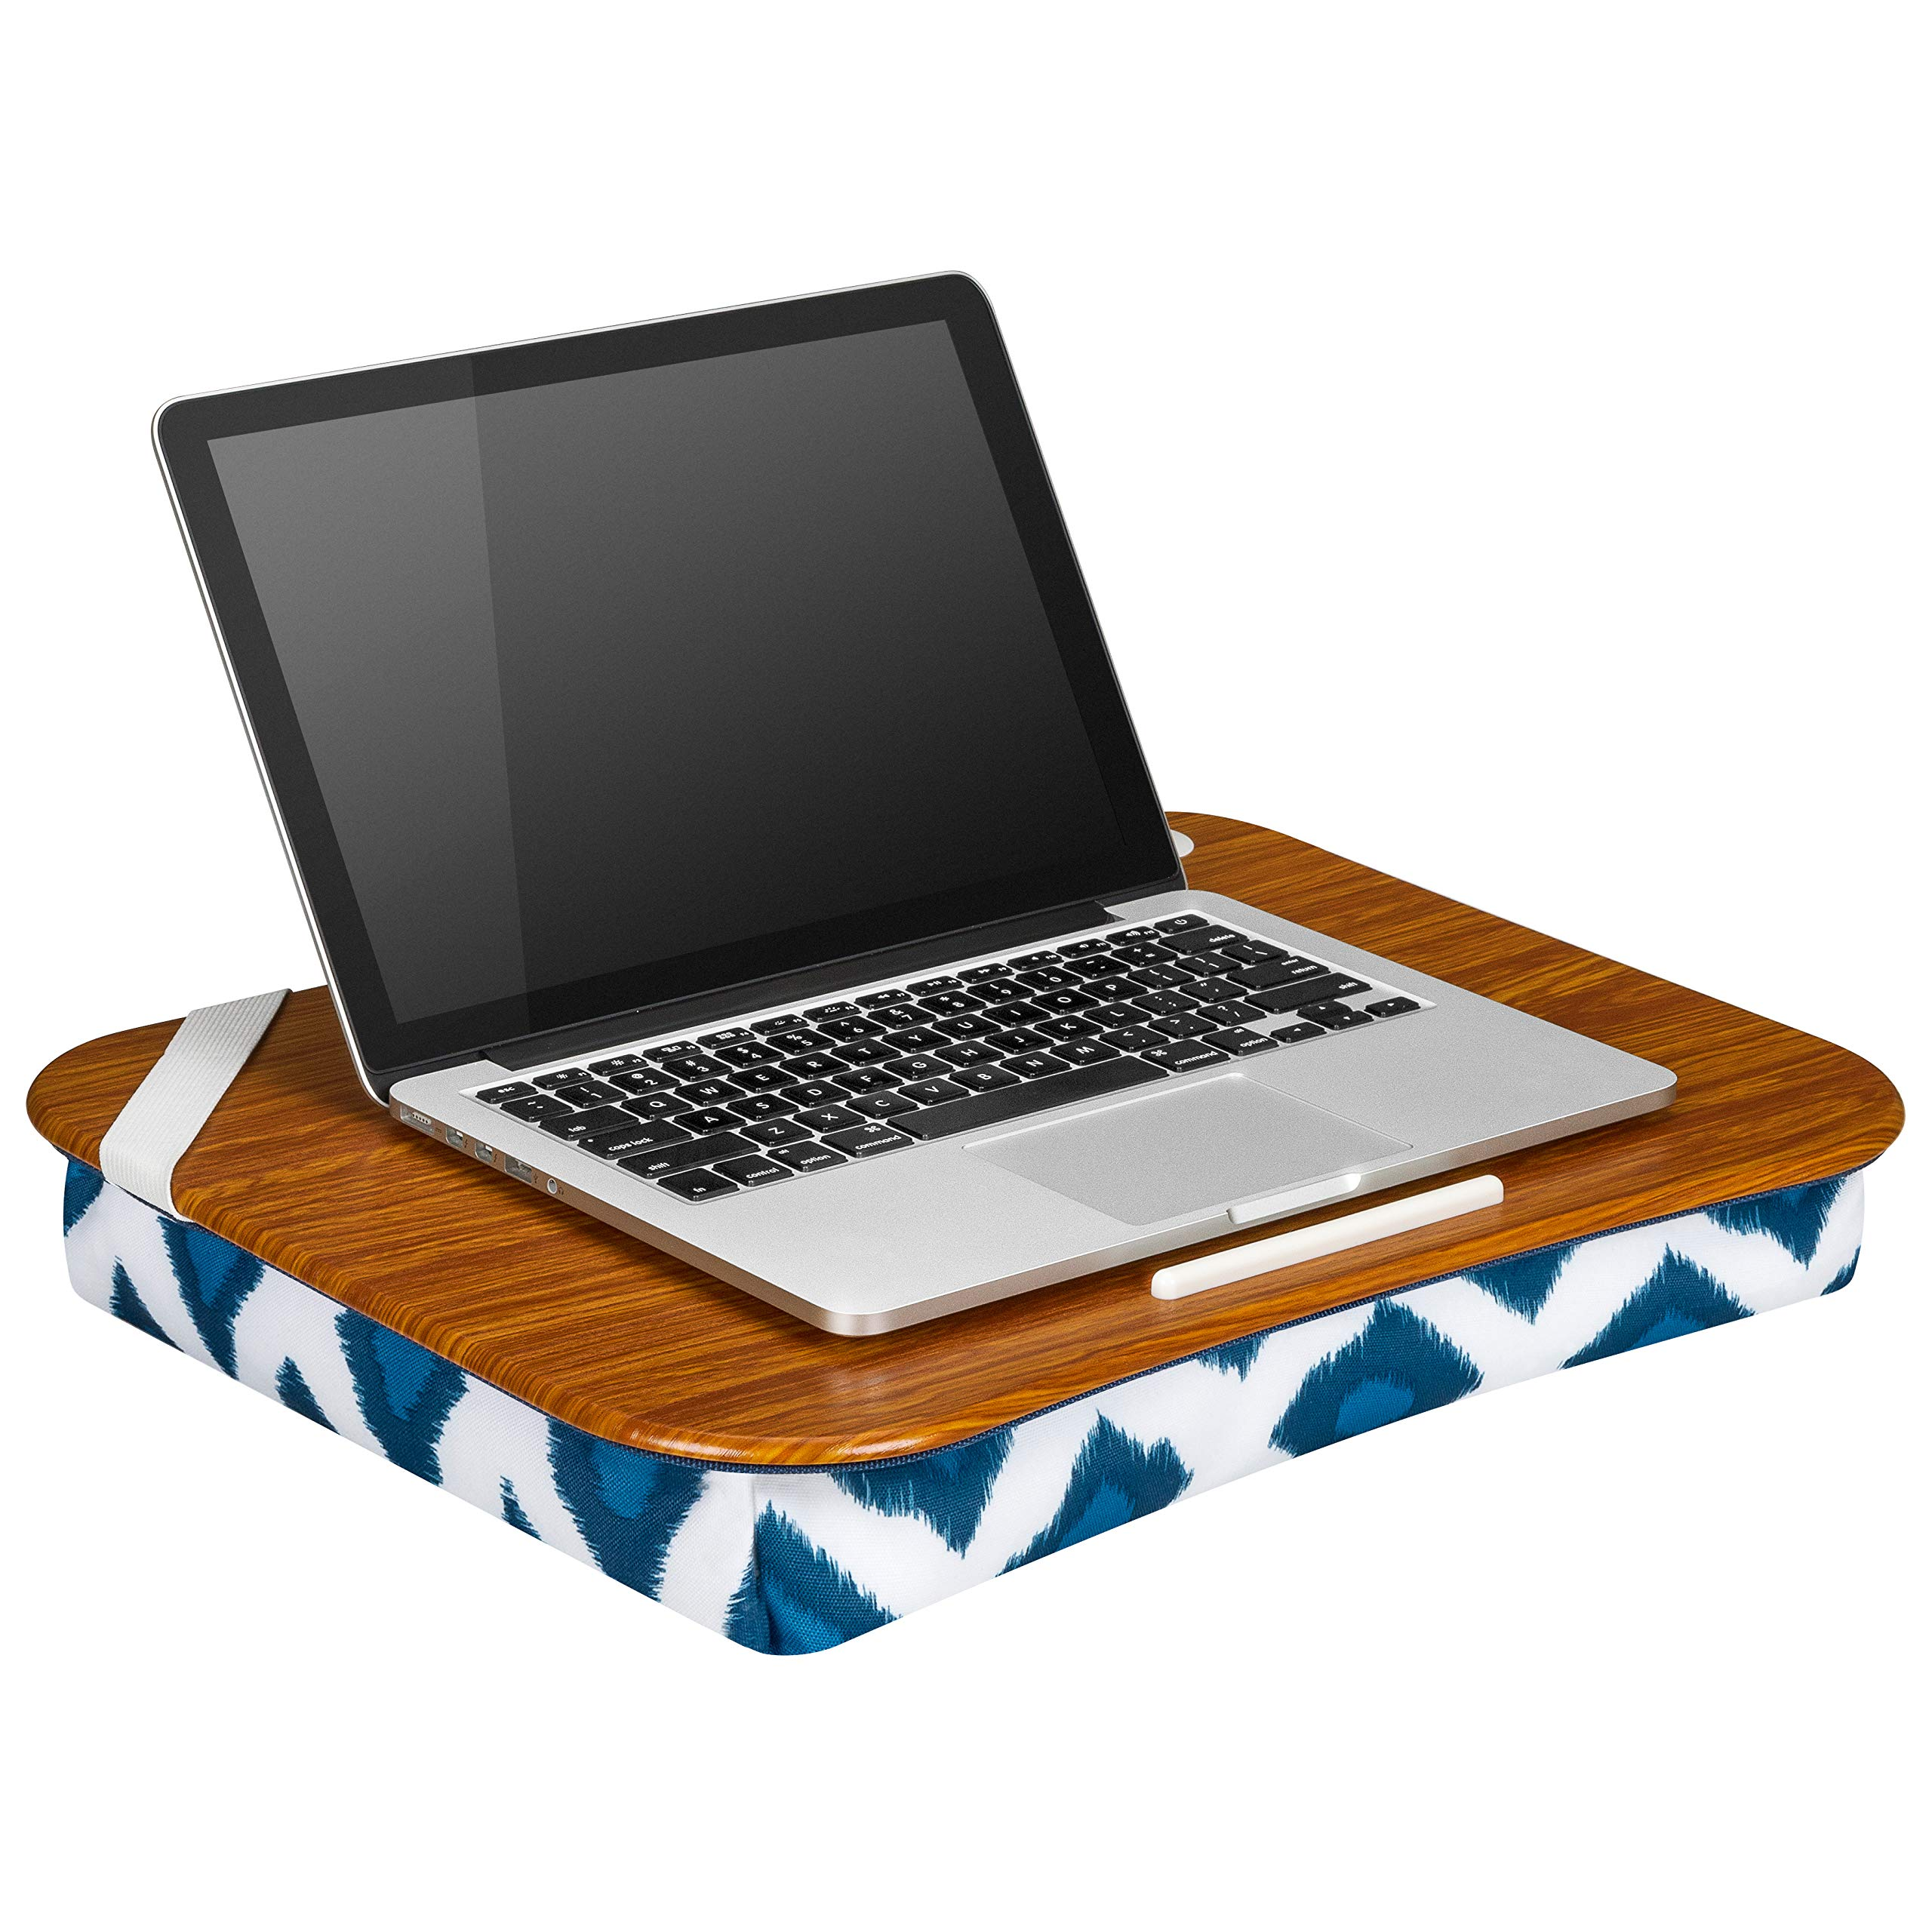 LapGear Designer Lap Desk - Navy Ikat - Style #45523